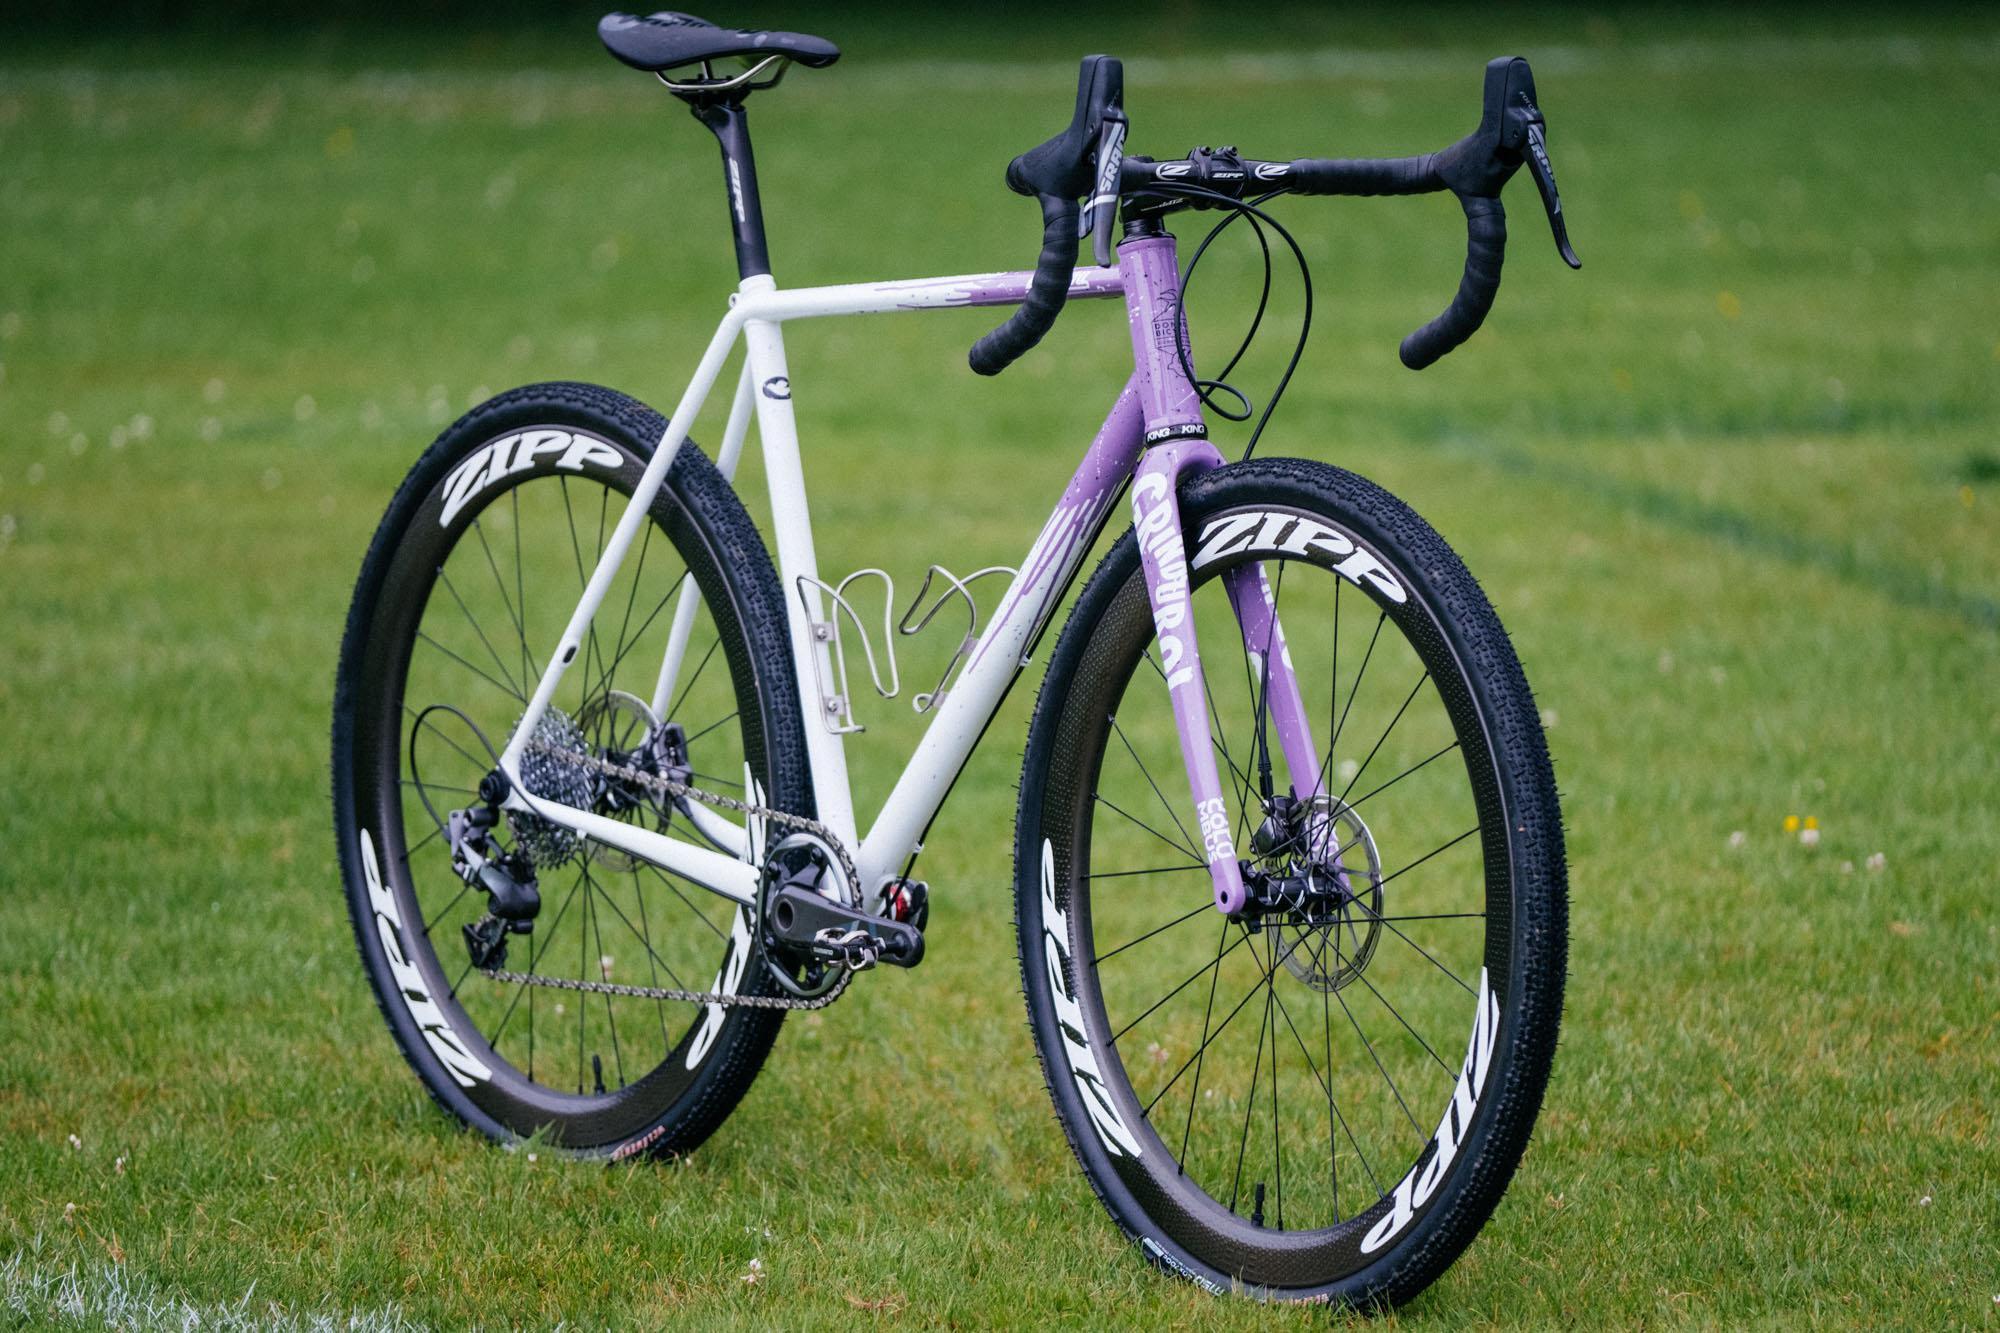 Donhou Bicycles